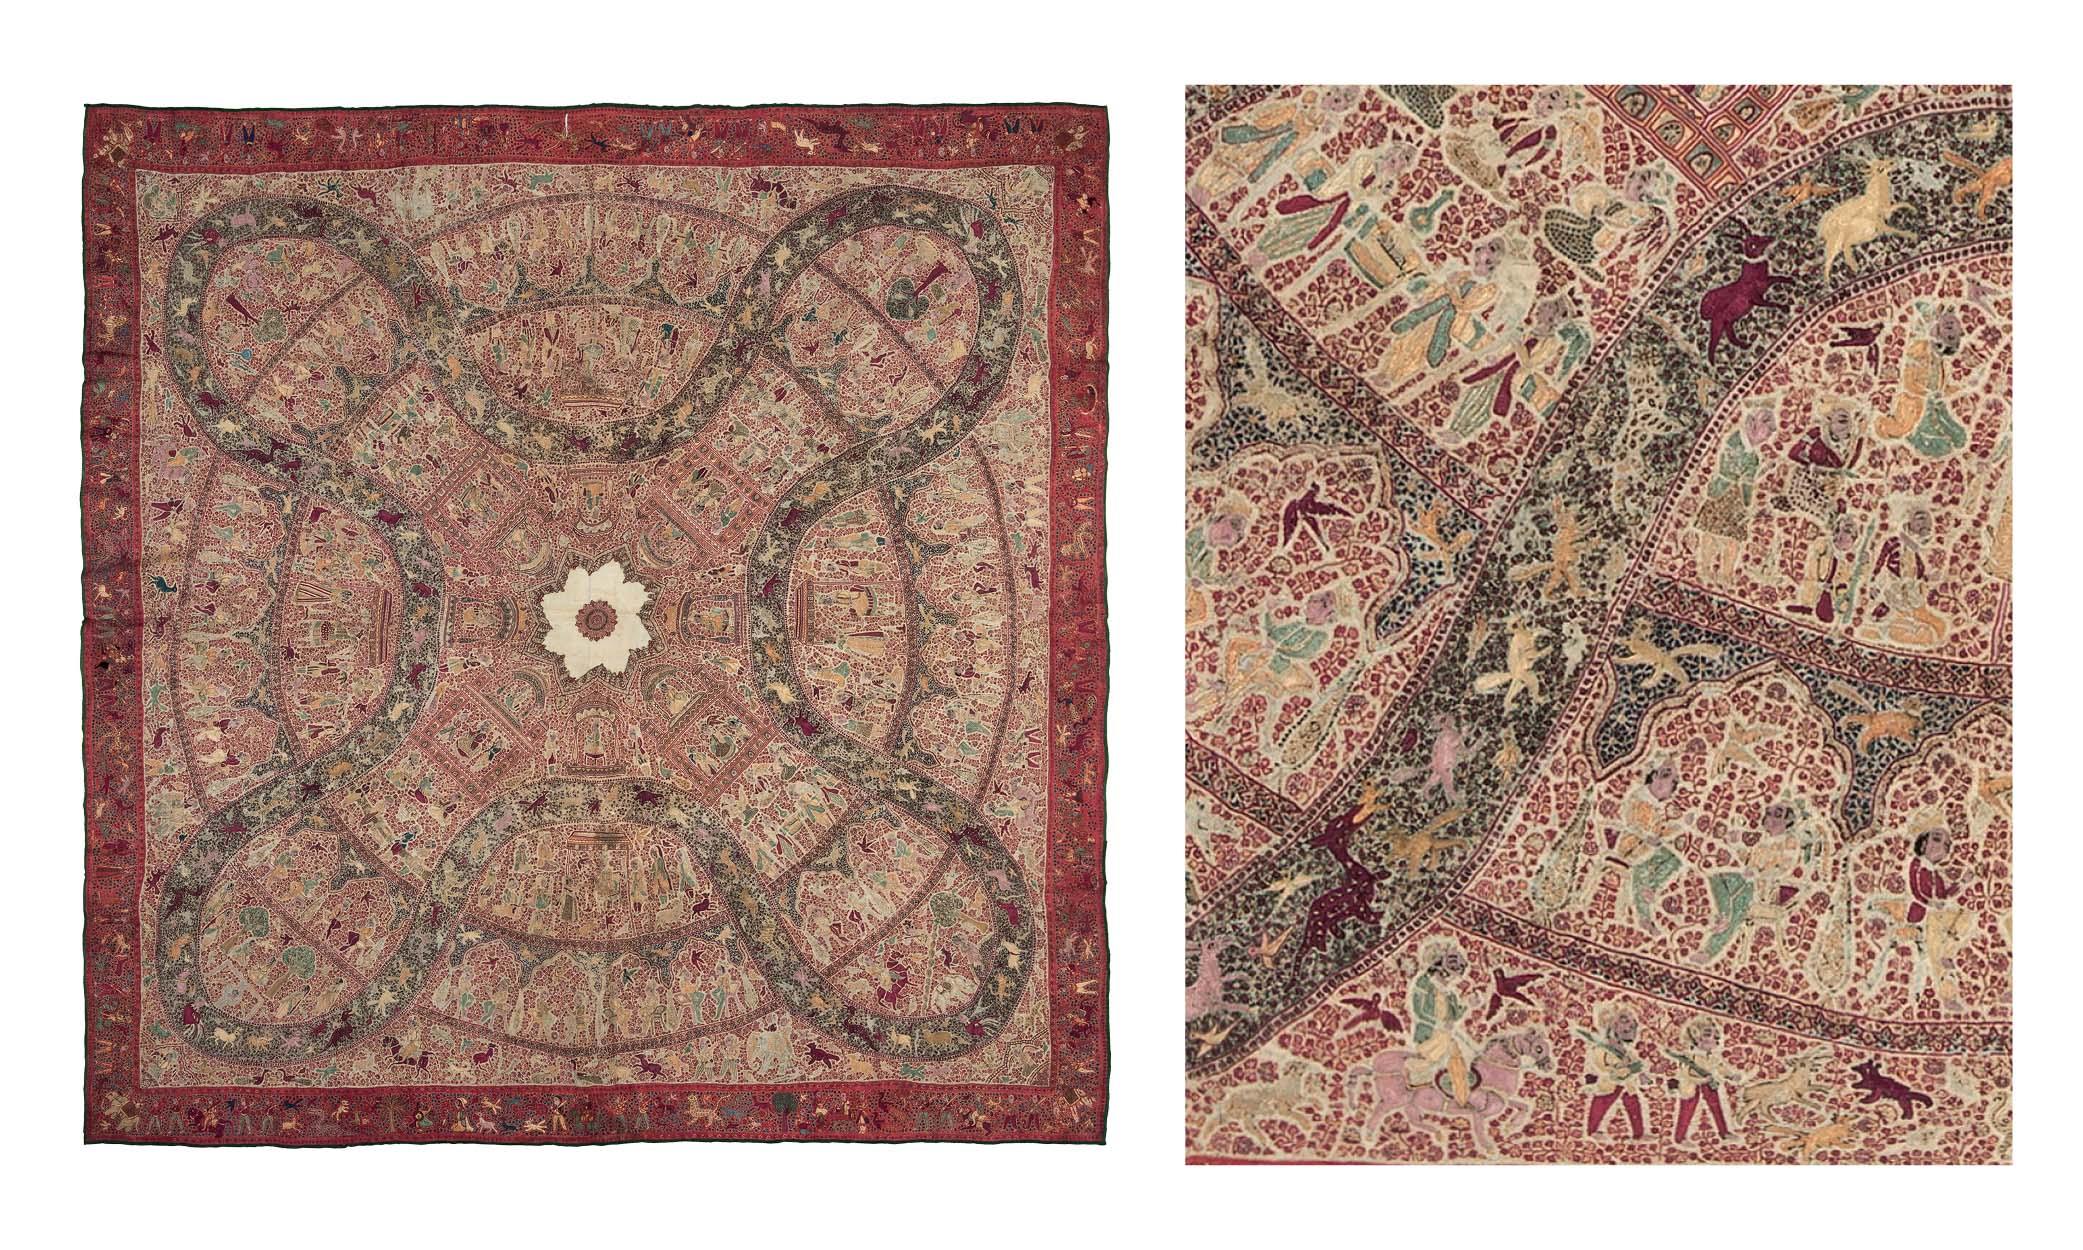 Kashmir embroidered square shawl, third quarter 19th century. Christie's, online sale, 11-18 June 2019, lot 55. Estimate £7,000-10,000, sold for £32,500